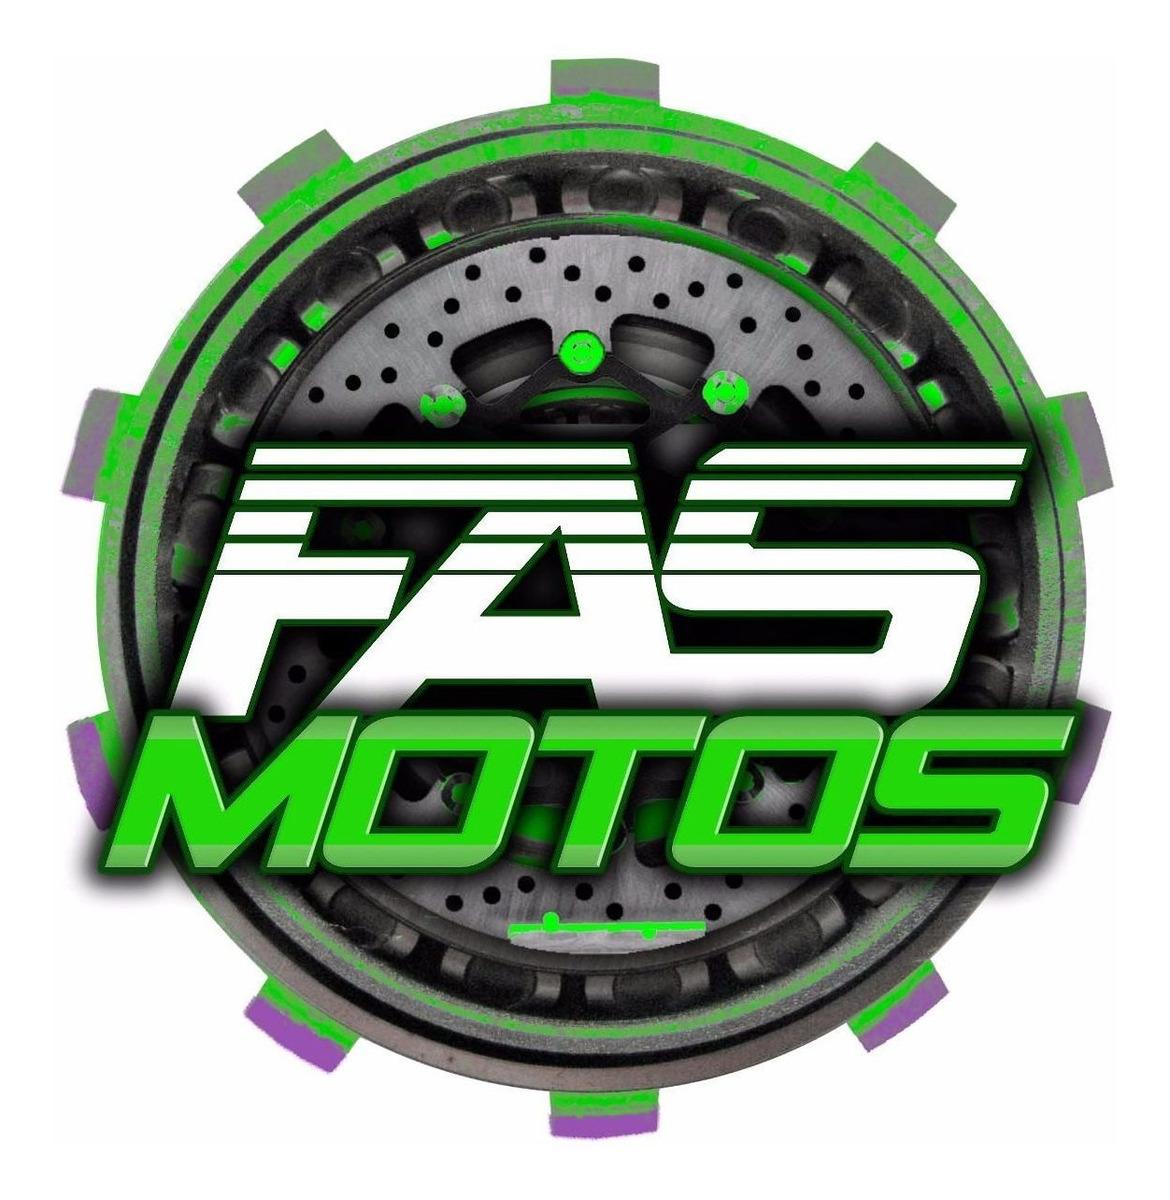 Botas Enduro Pro Tork Combat 4 Br Atv Motocross En Fas Motos